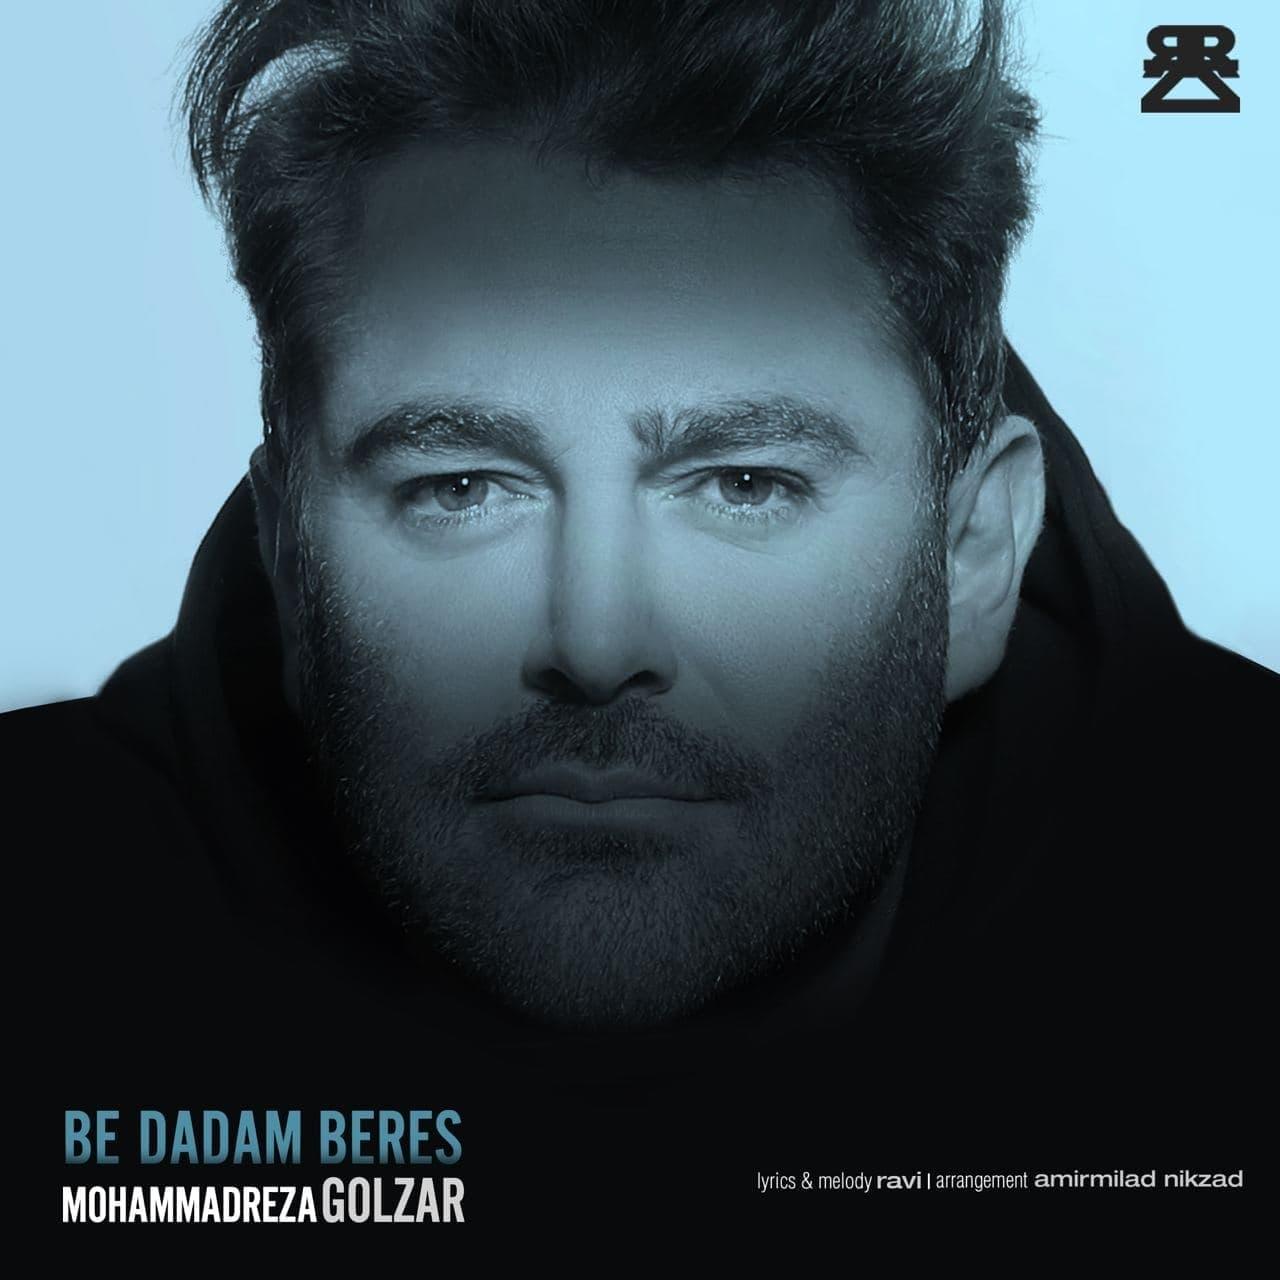 Mohammadreza Golzar – Be Dadam Beres